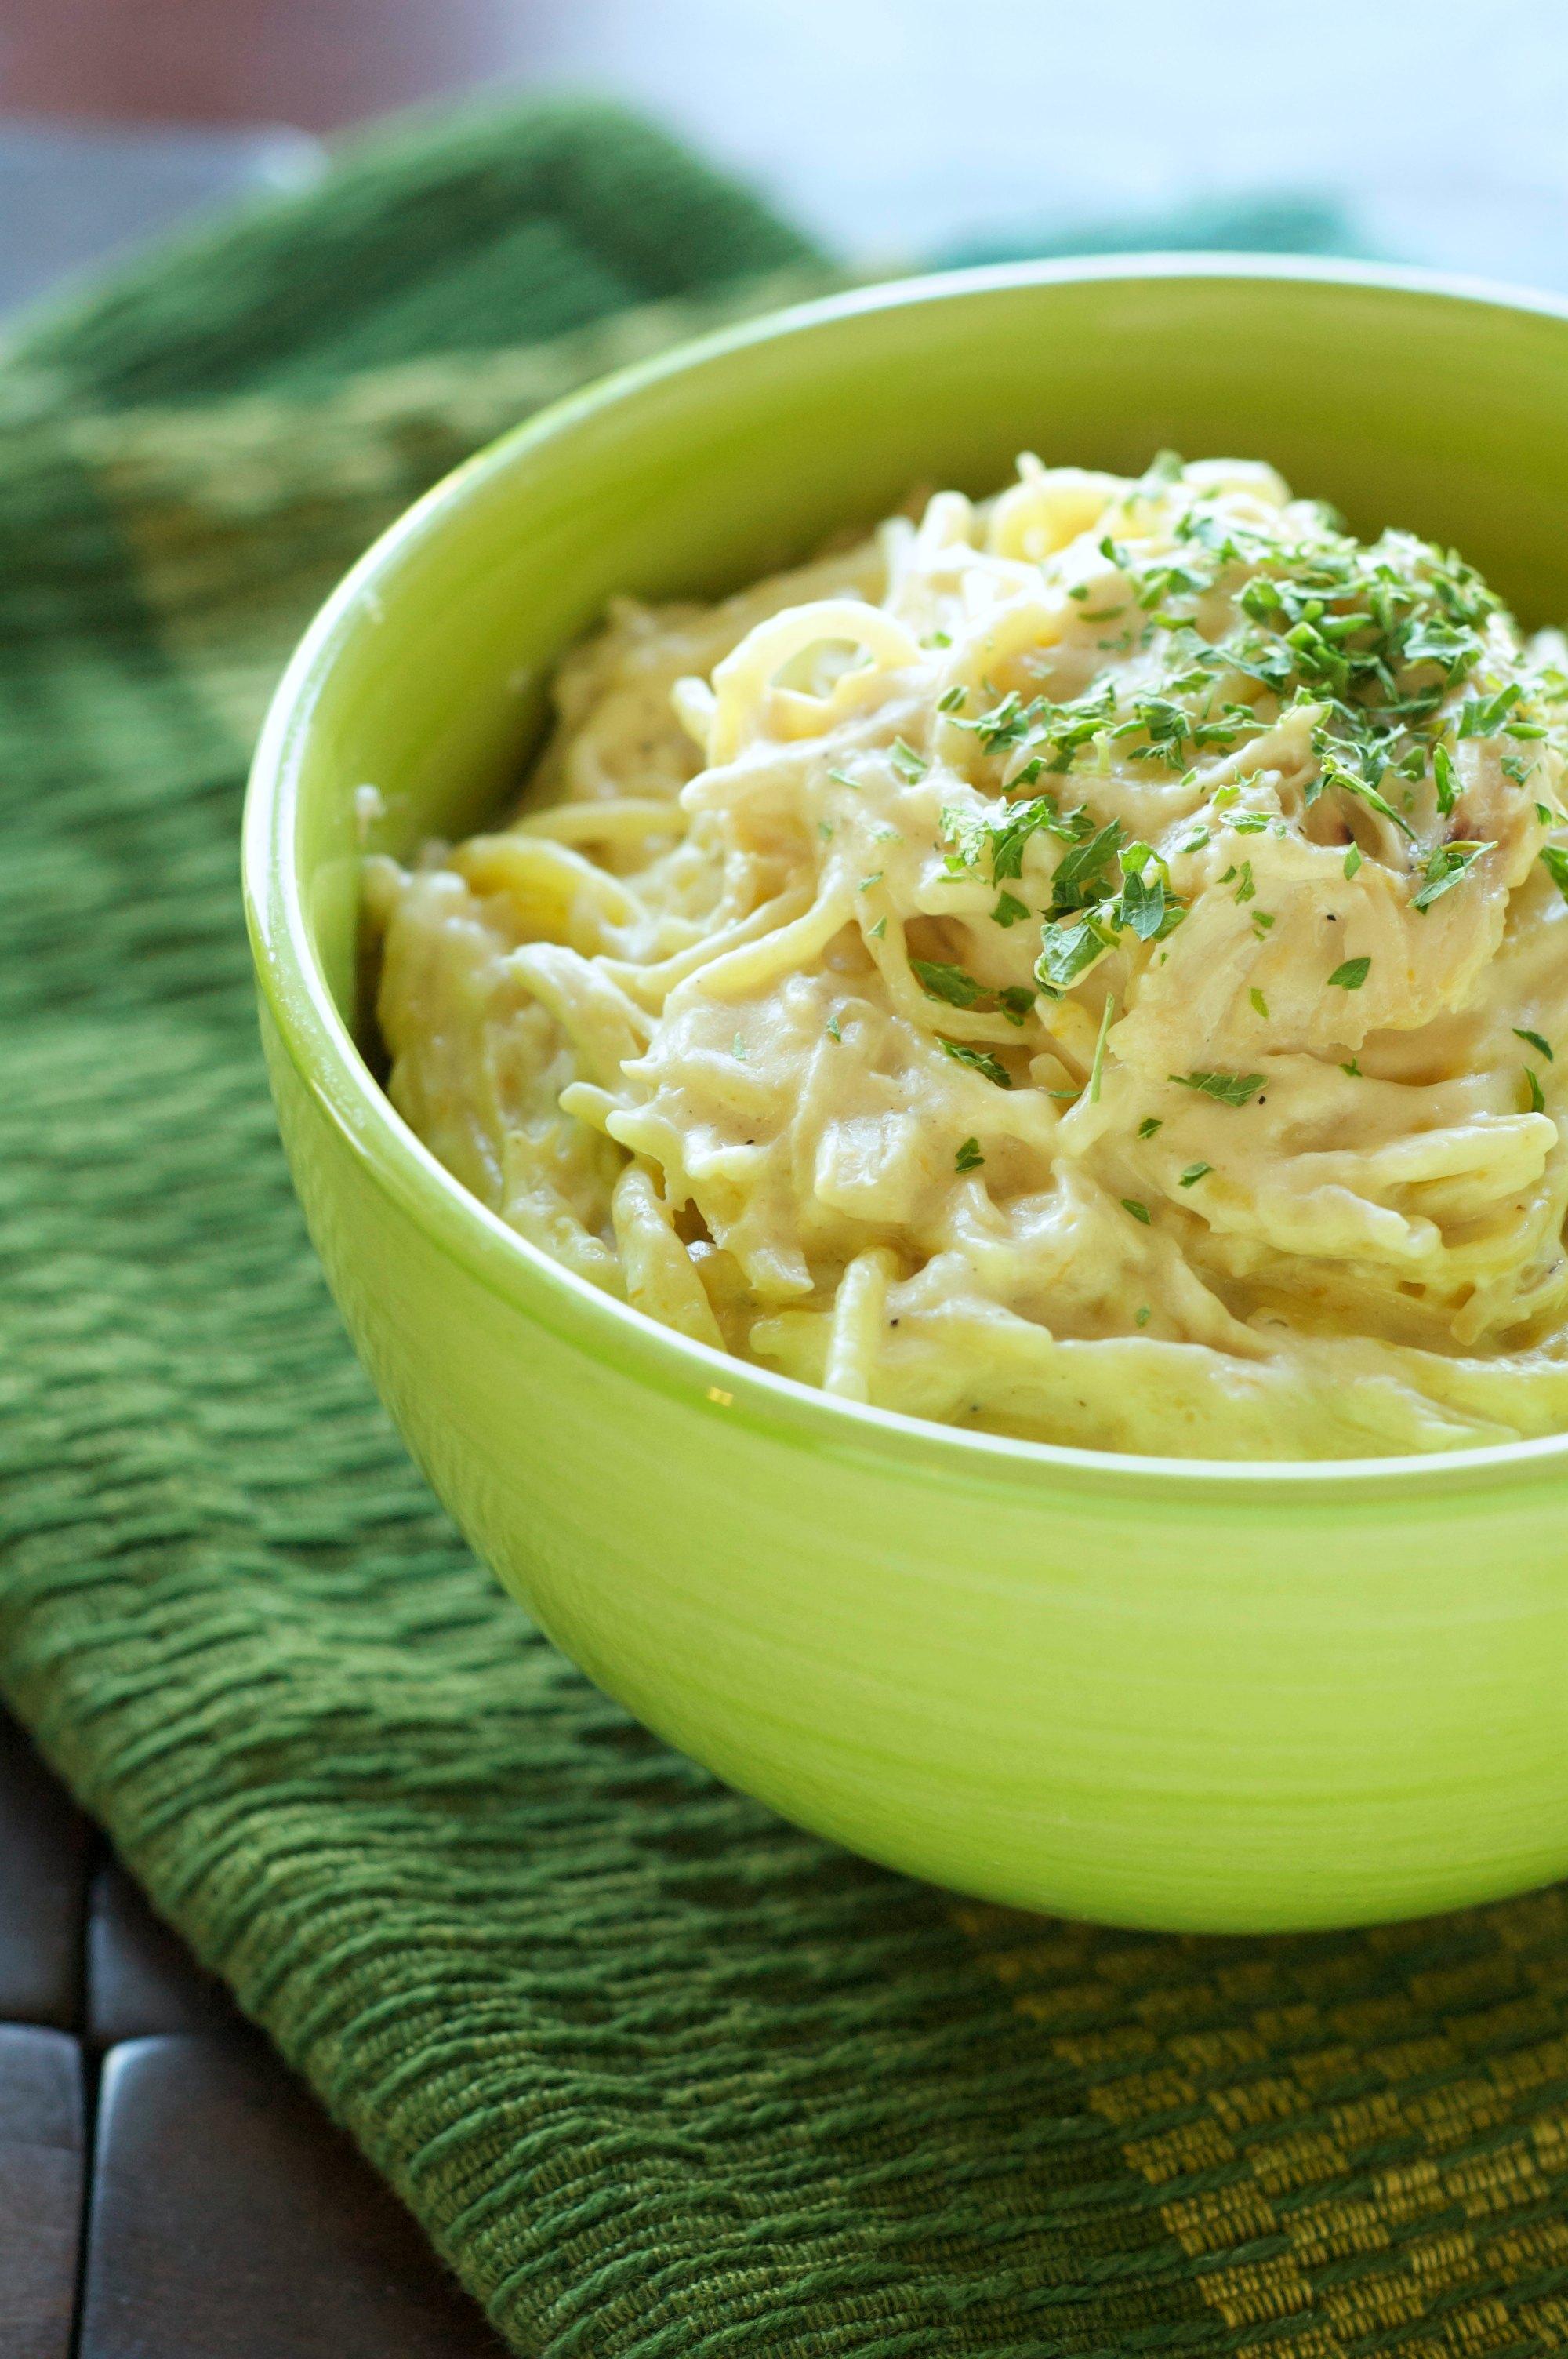 Crockpot Creamy Cheesy Chicken Spaghetti   Crockpot Gourmet